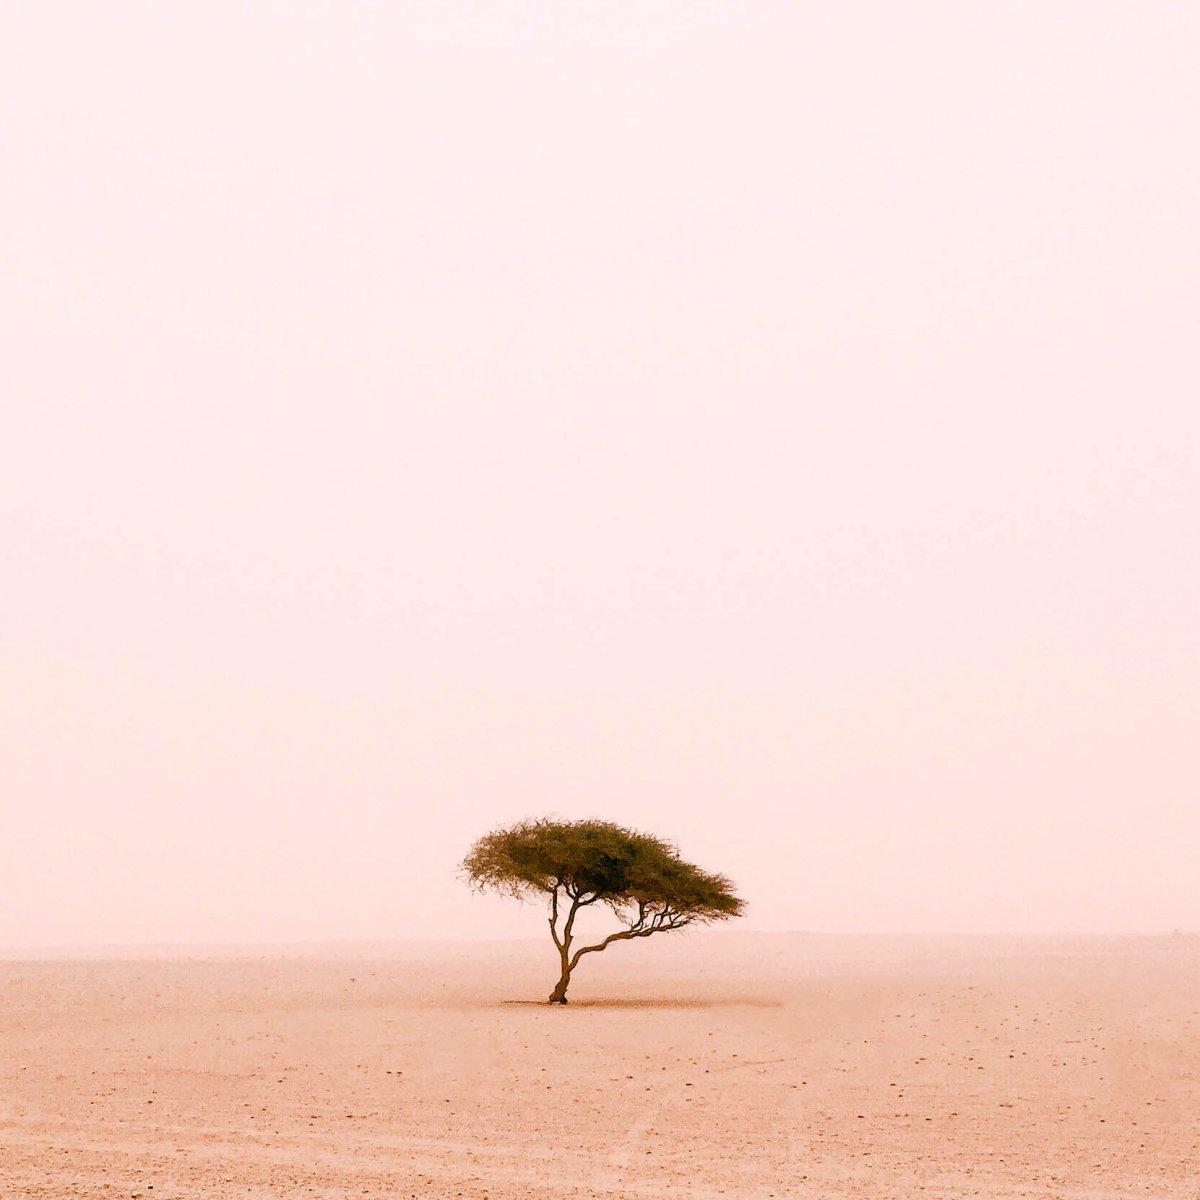 tree photos in Qatar